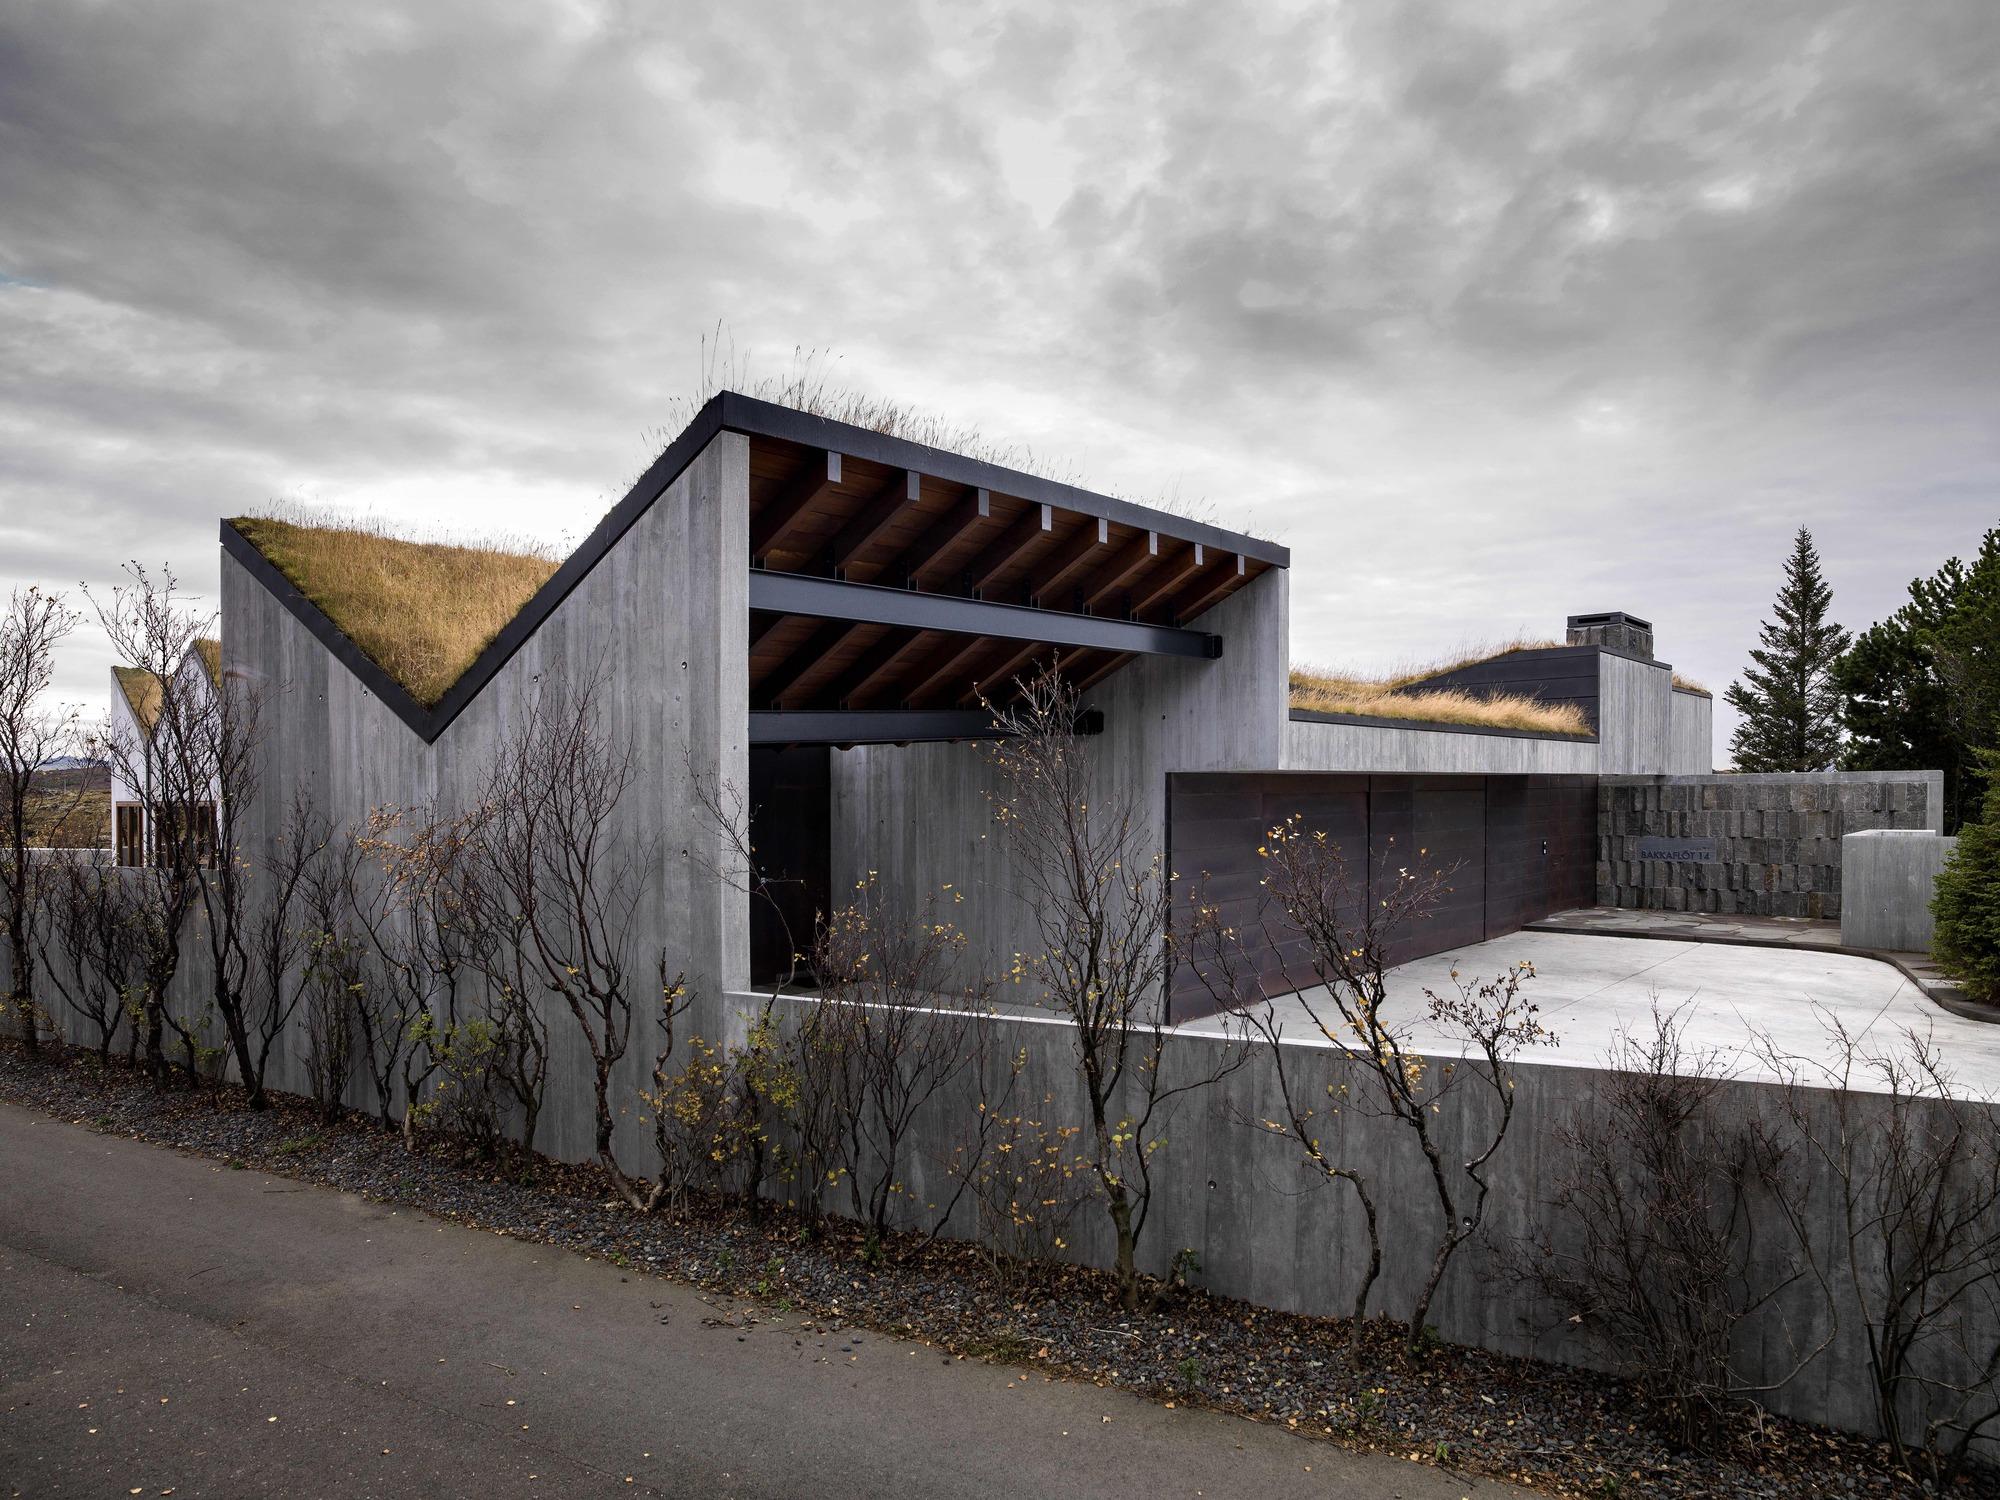 B14 Studio Granda Architecture from Iceland